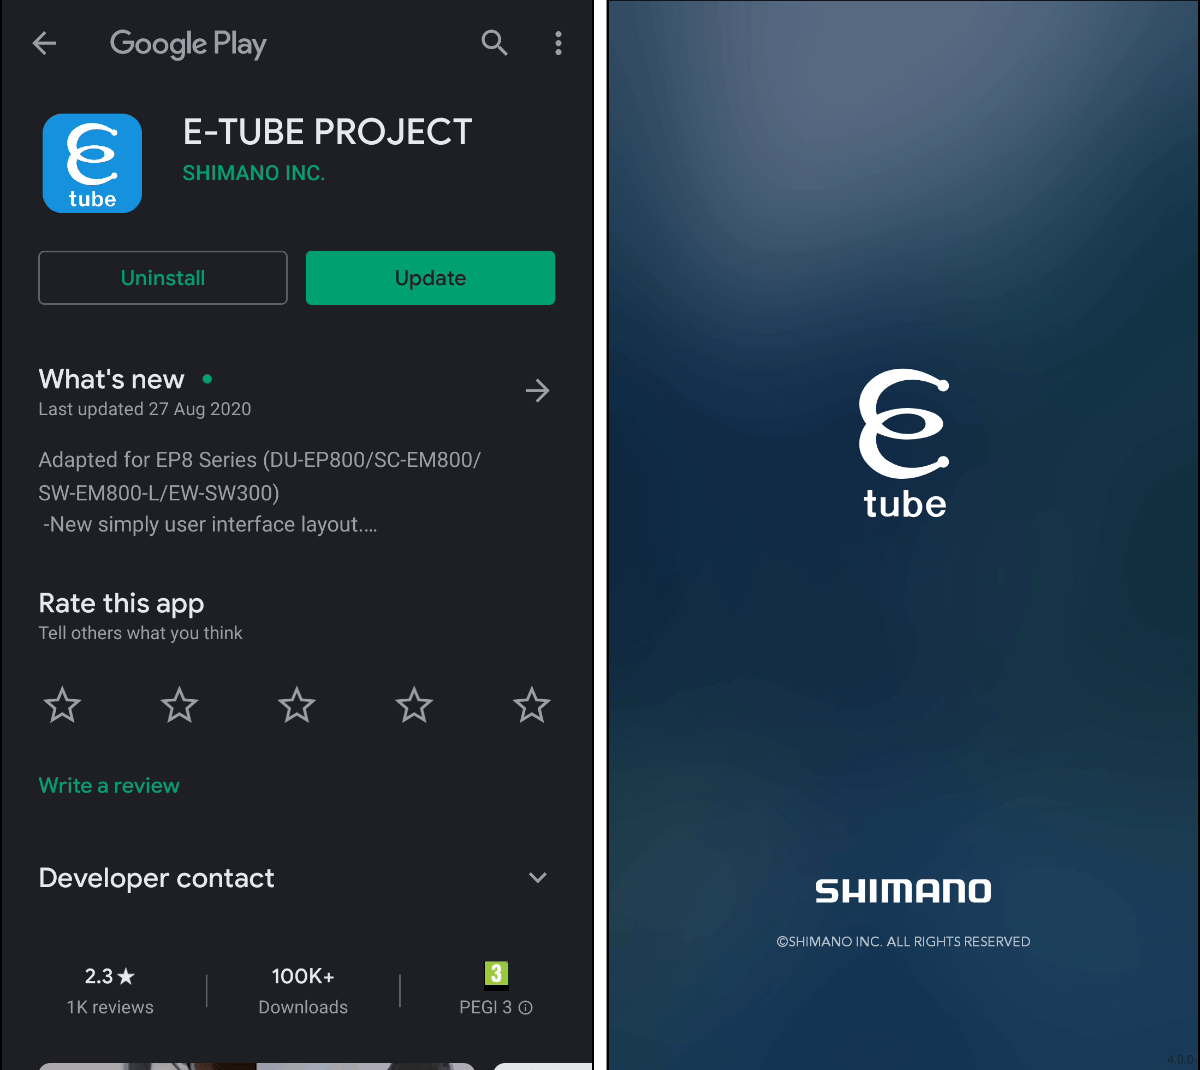 New E-Tube Project